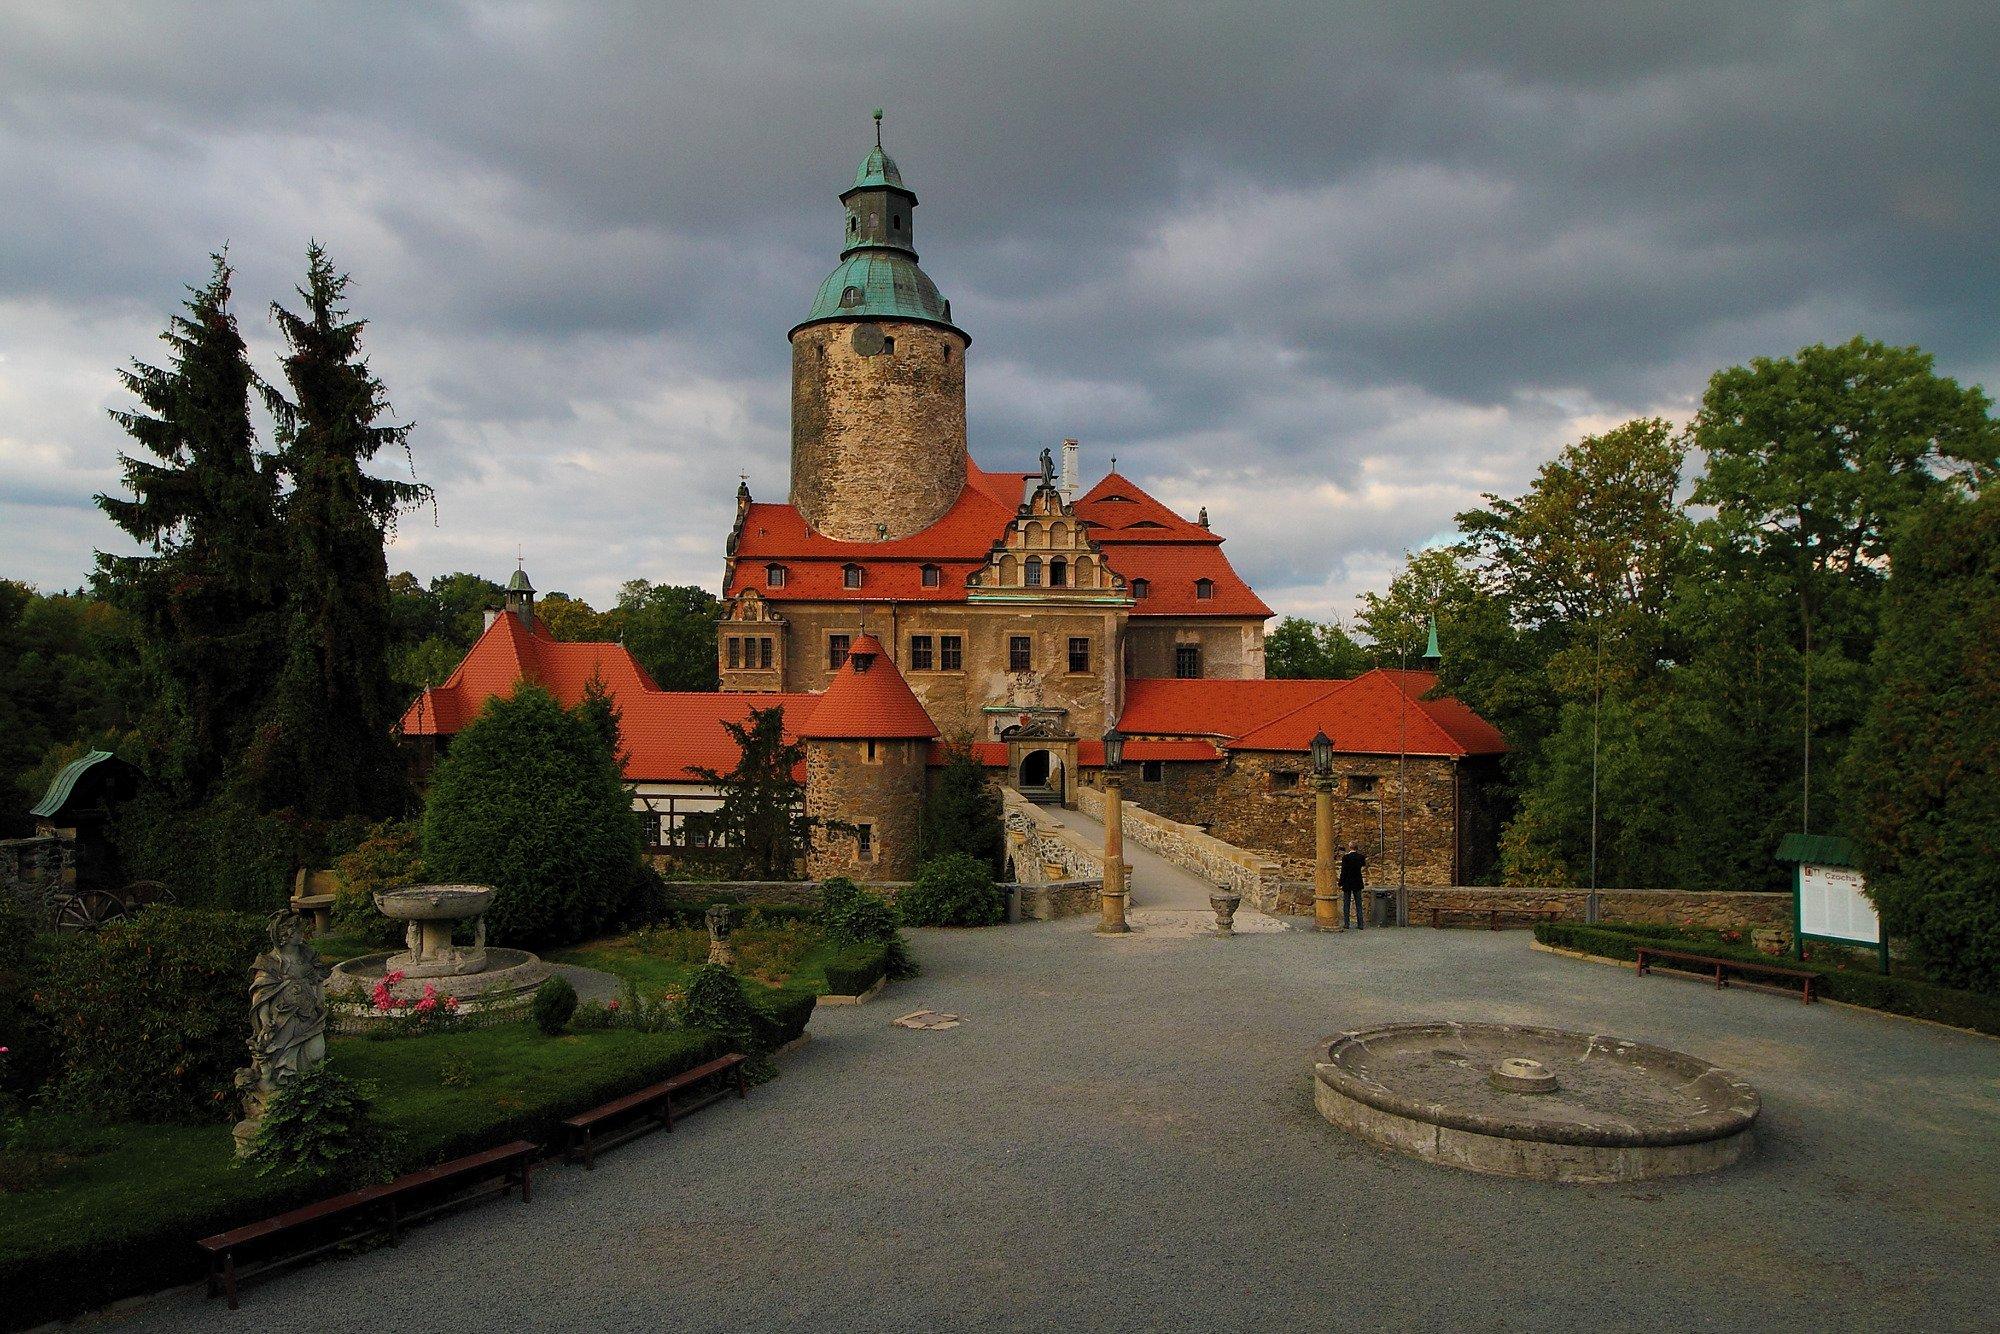 Czoch Castle Hotel